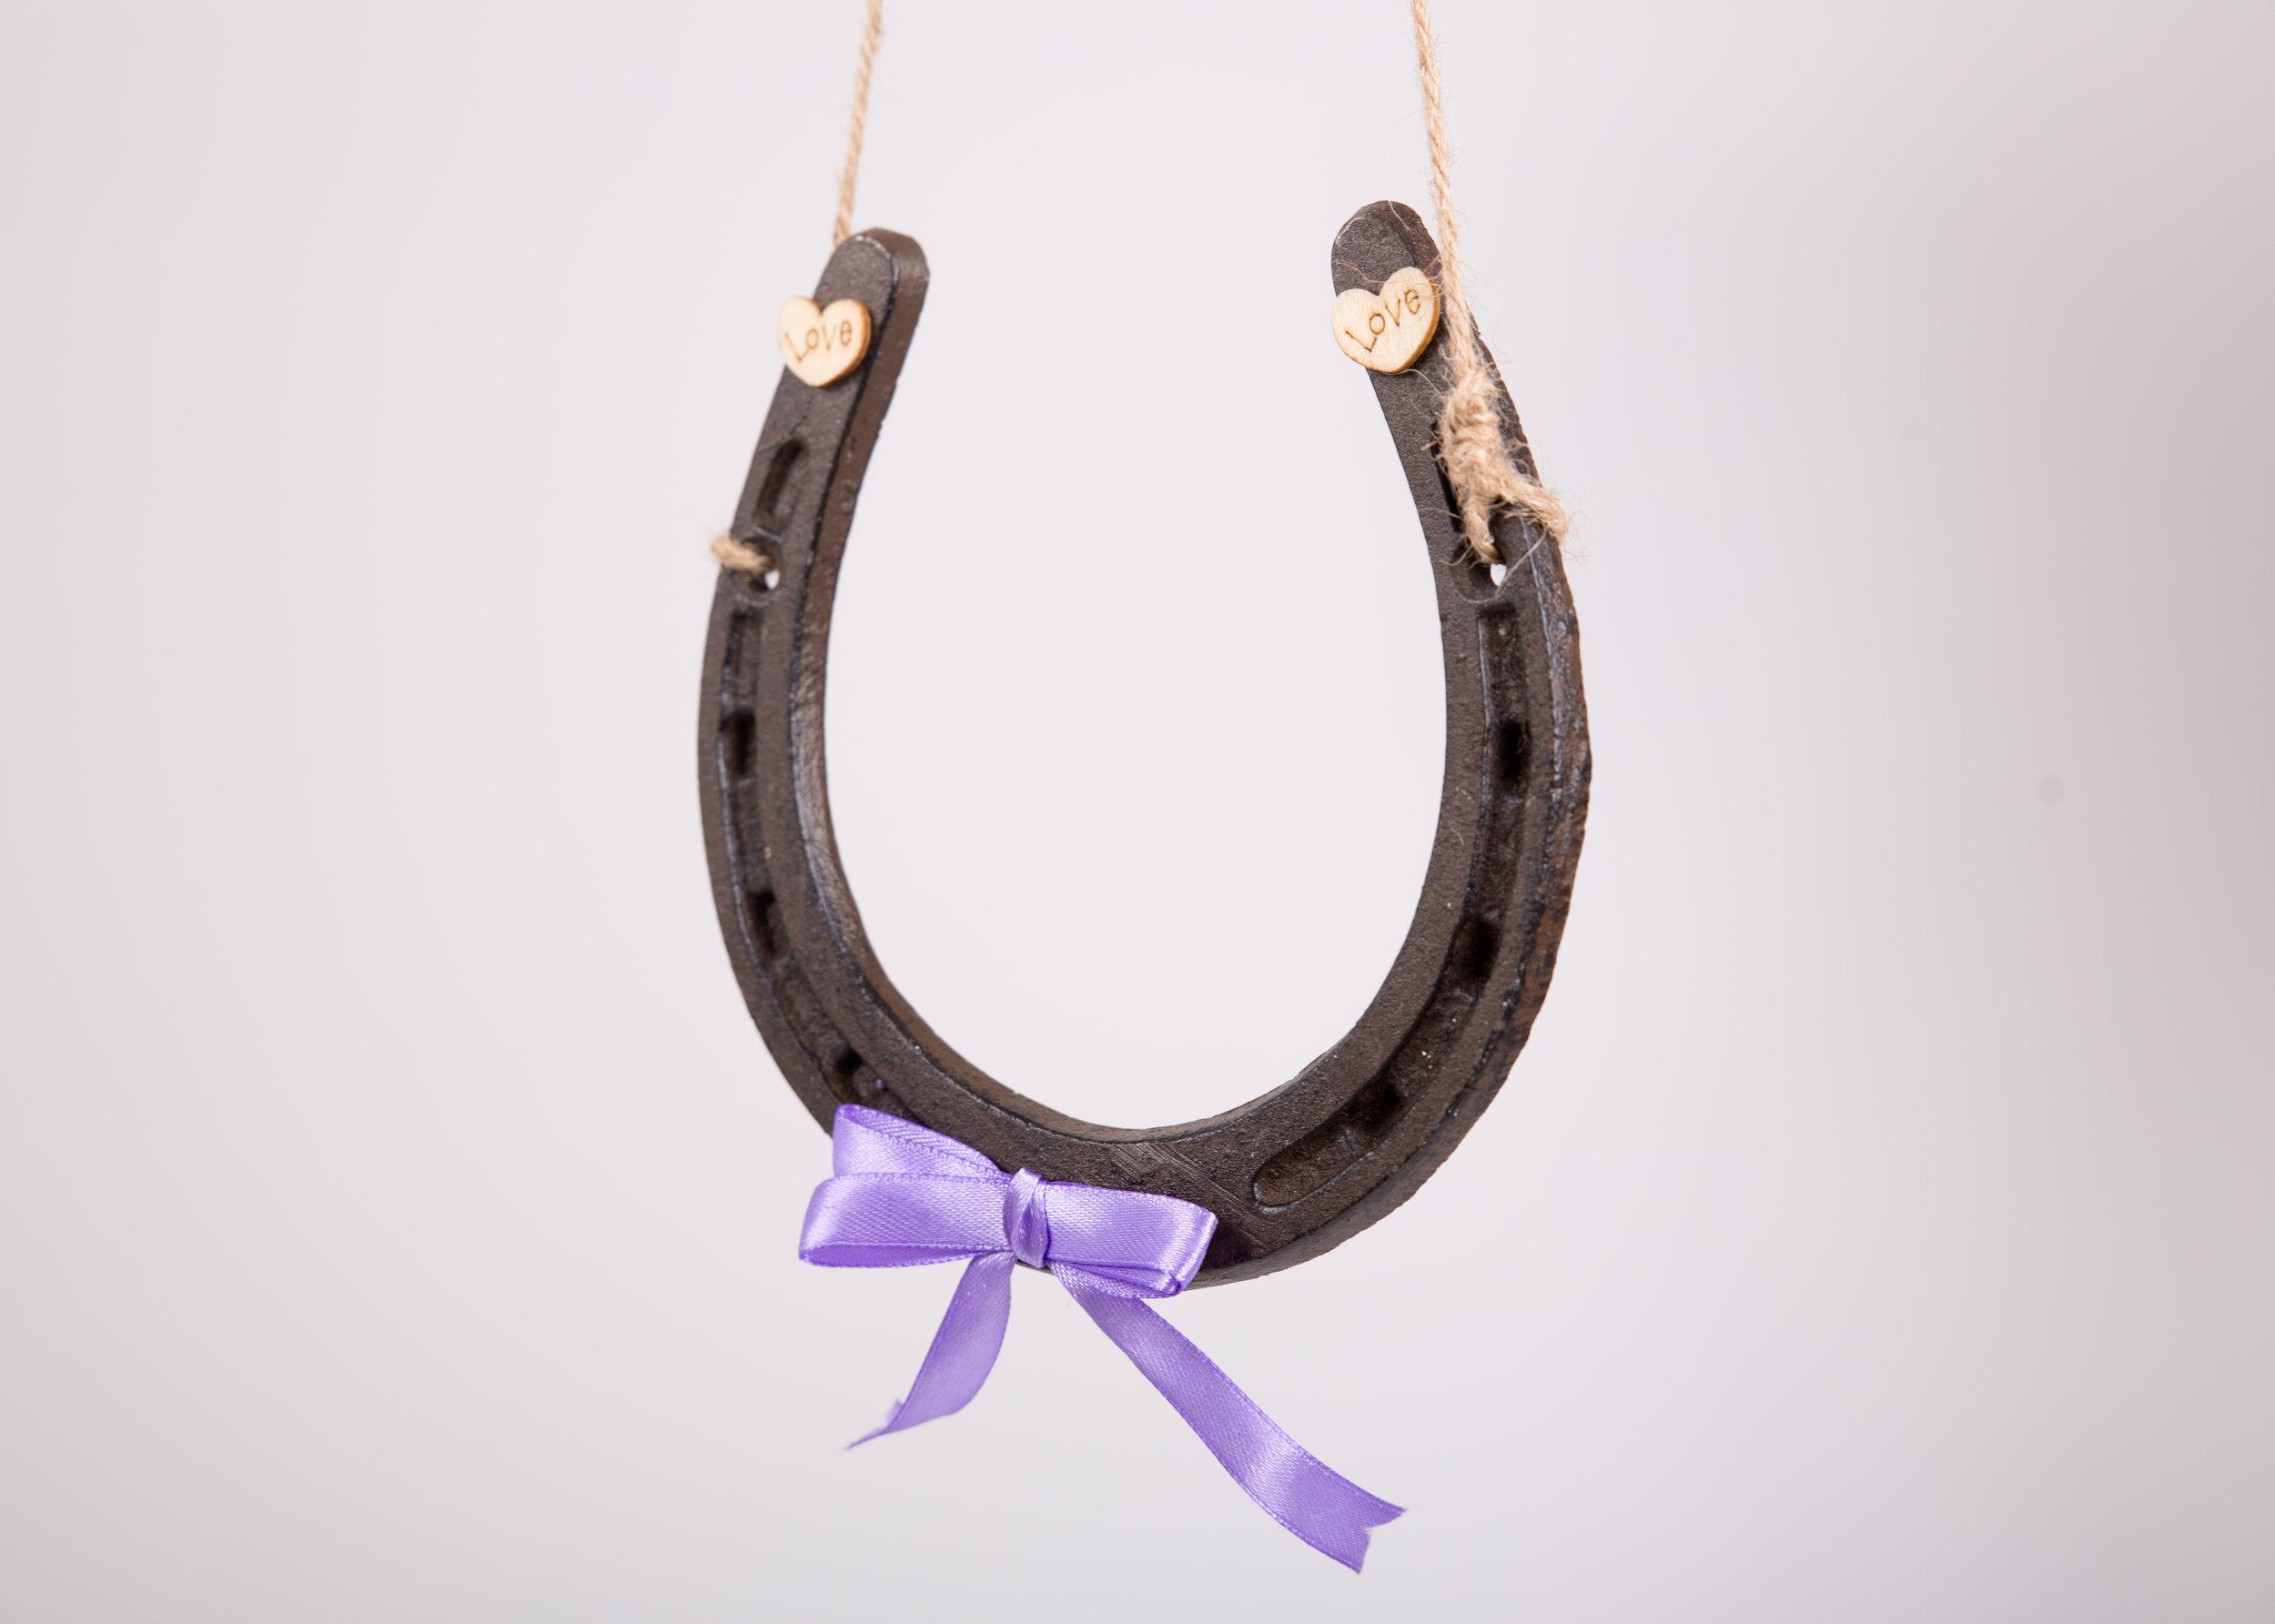 Horseshoe (DLL012)